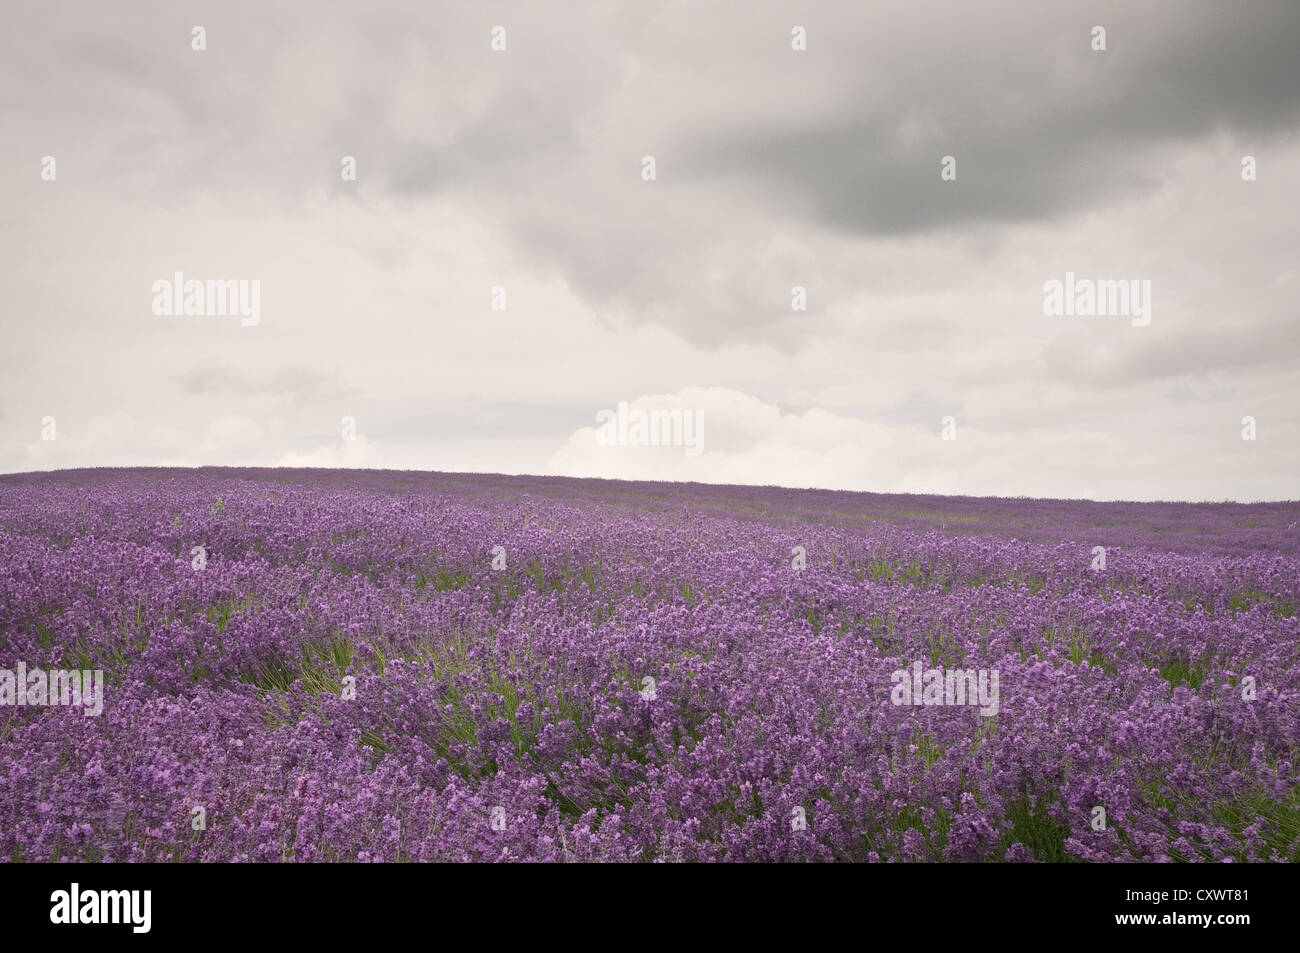 Field of purple flowers under cloudy sky - Stock Image